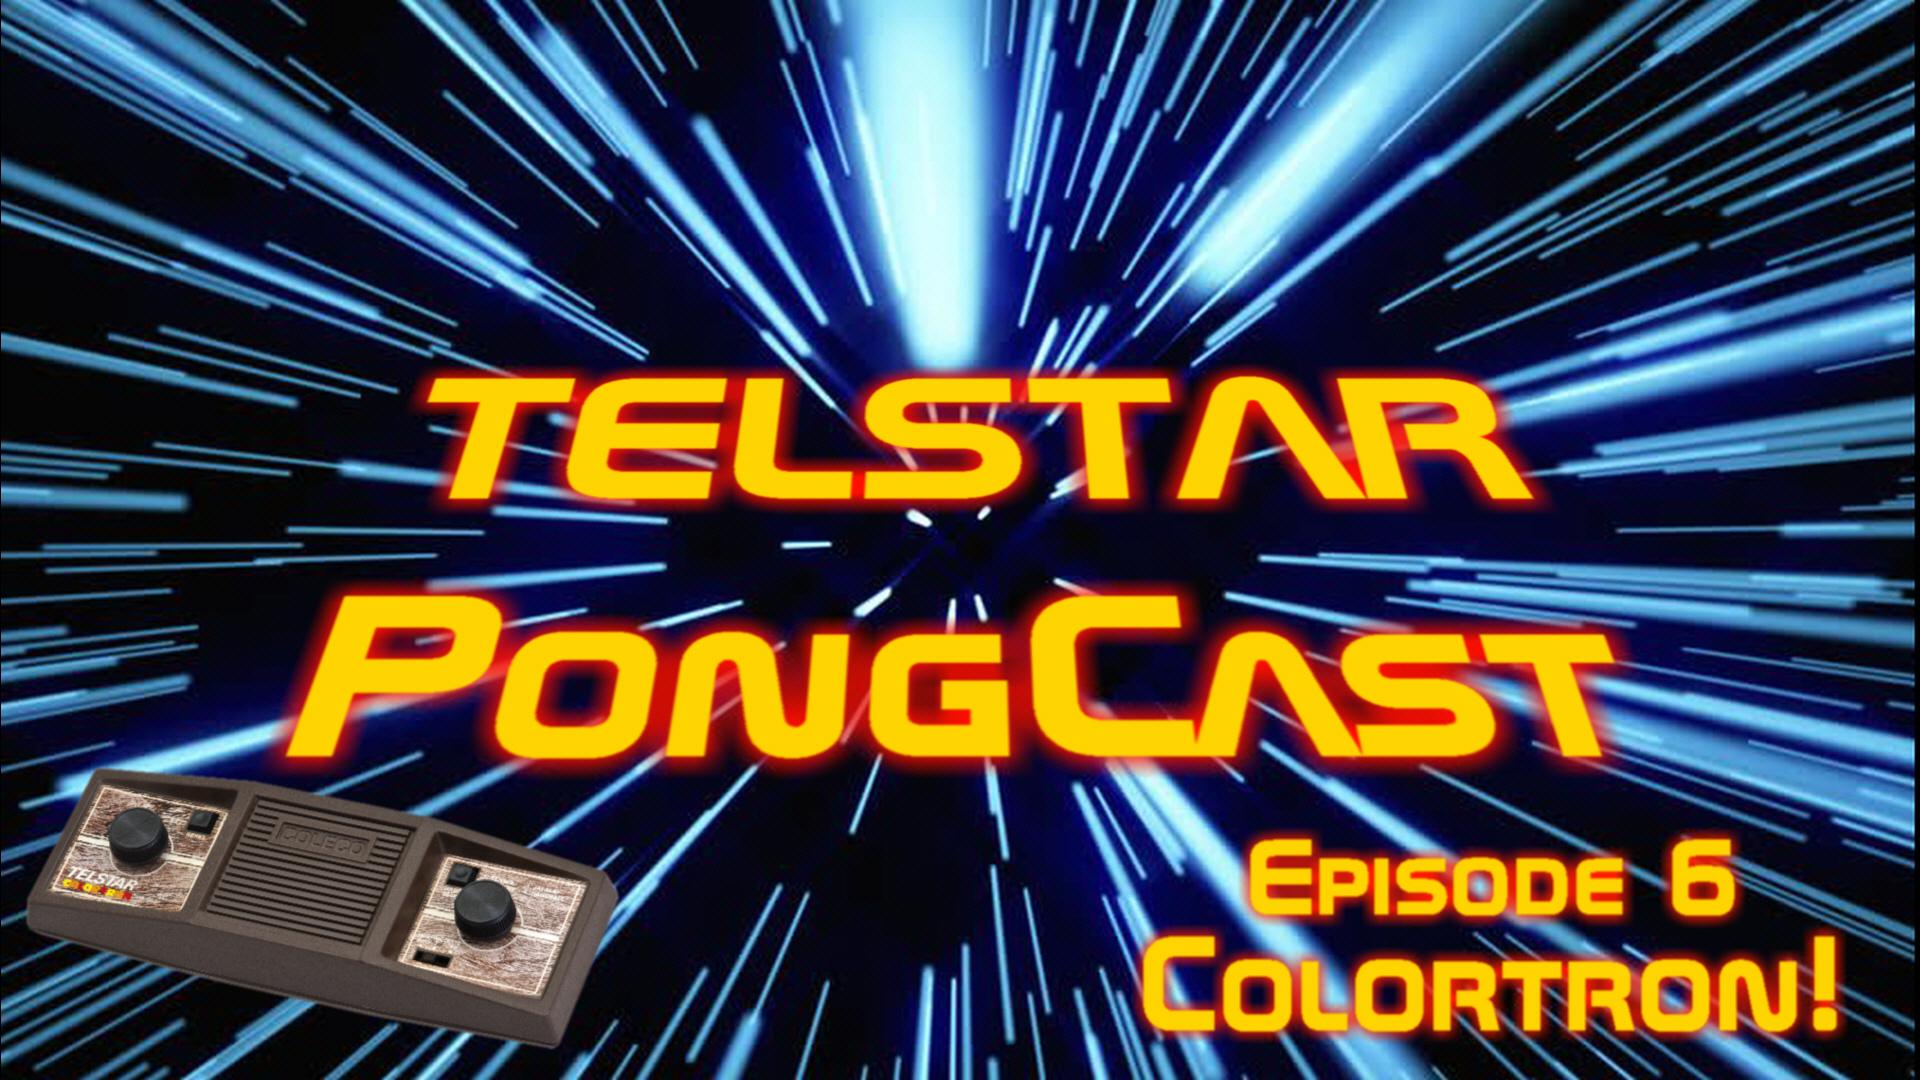 Telstar PongCast EP: 06 The ColorTron! show art